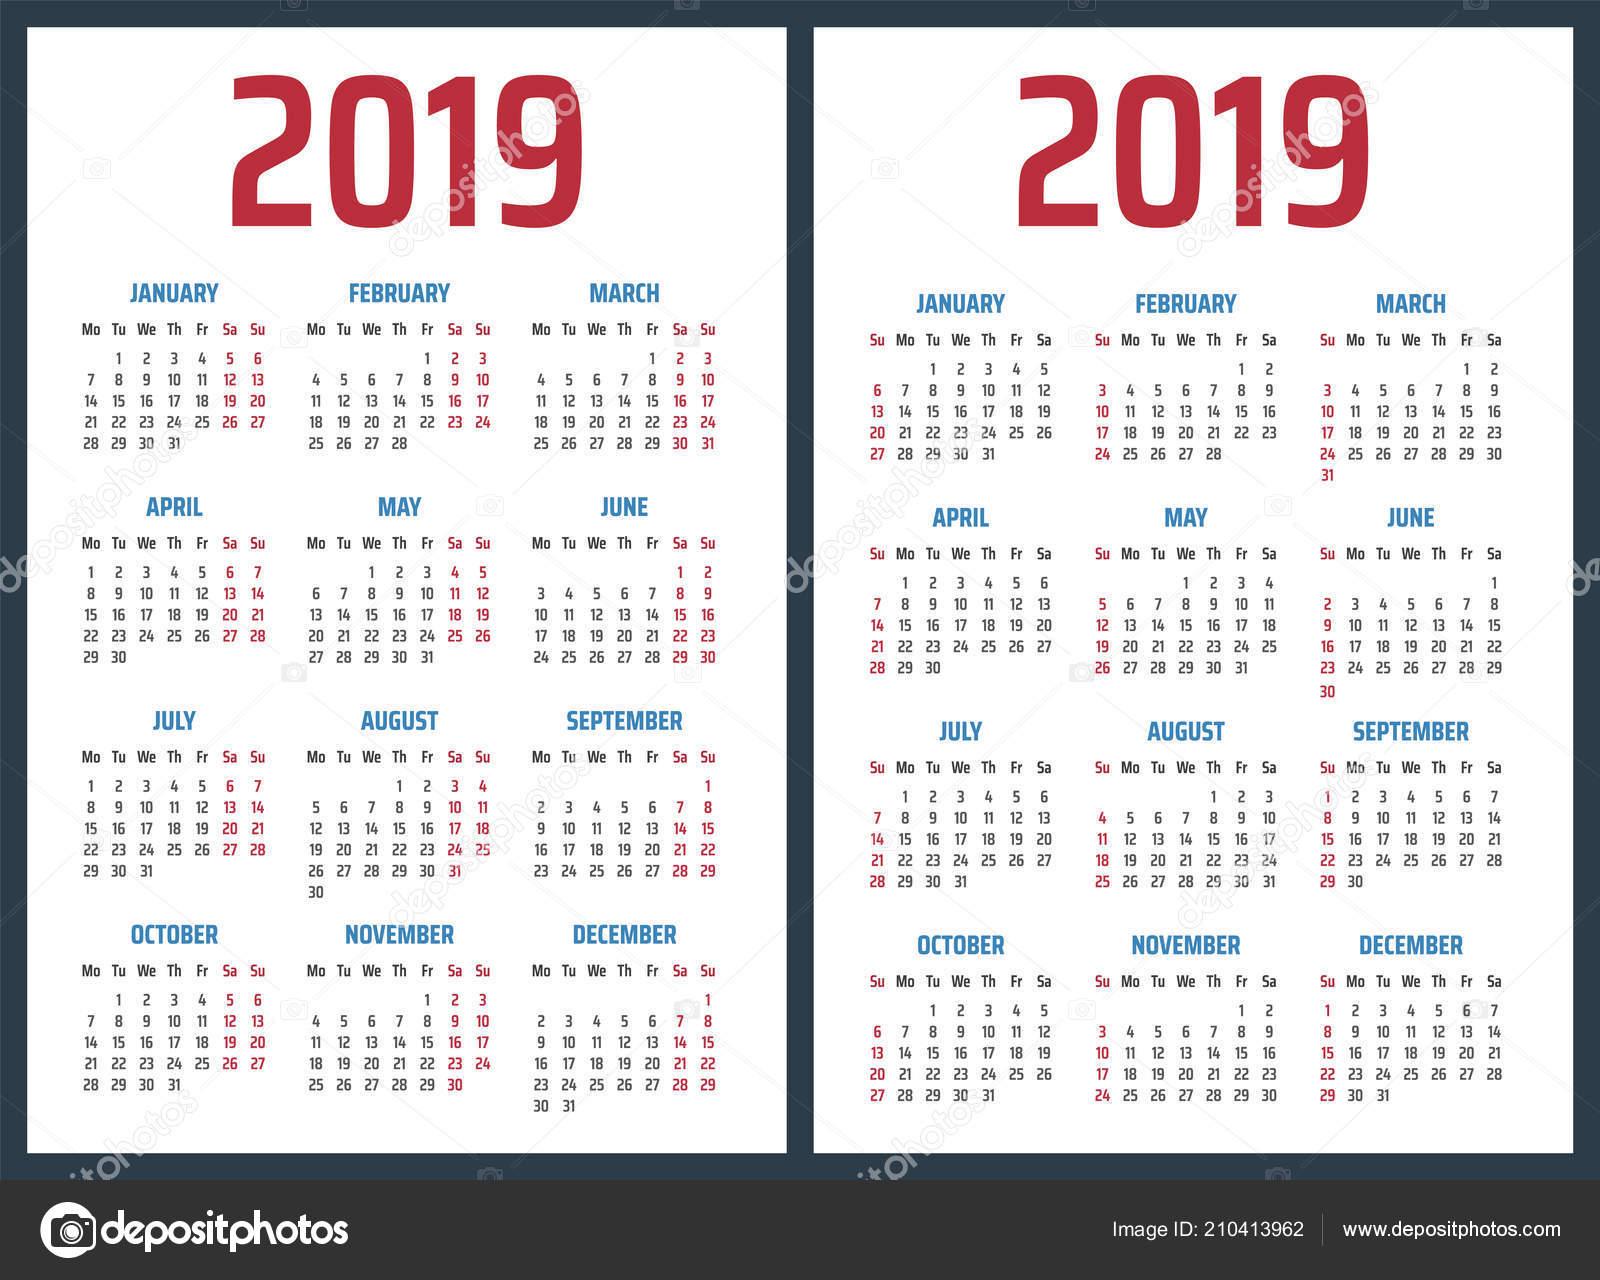 31 Ocak 2019 Pazar